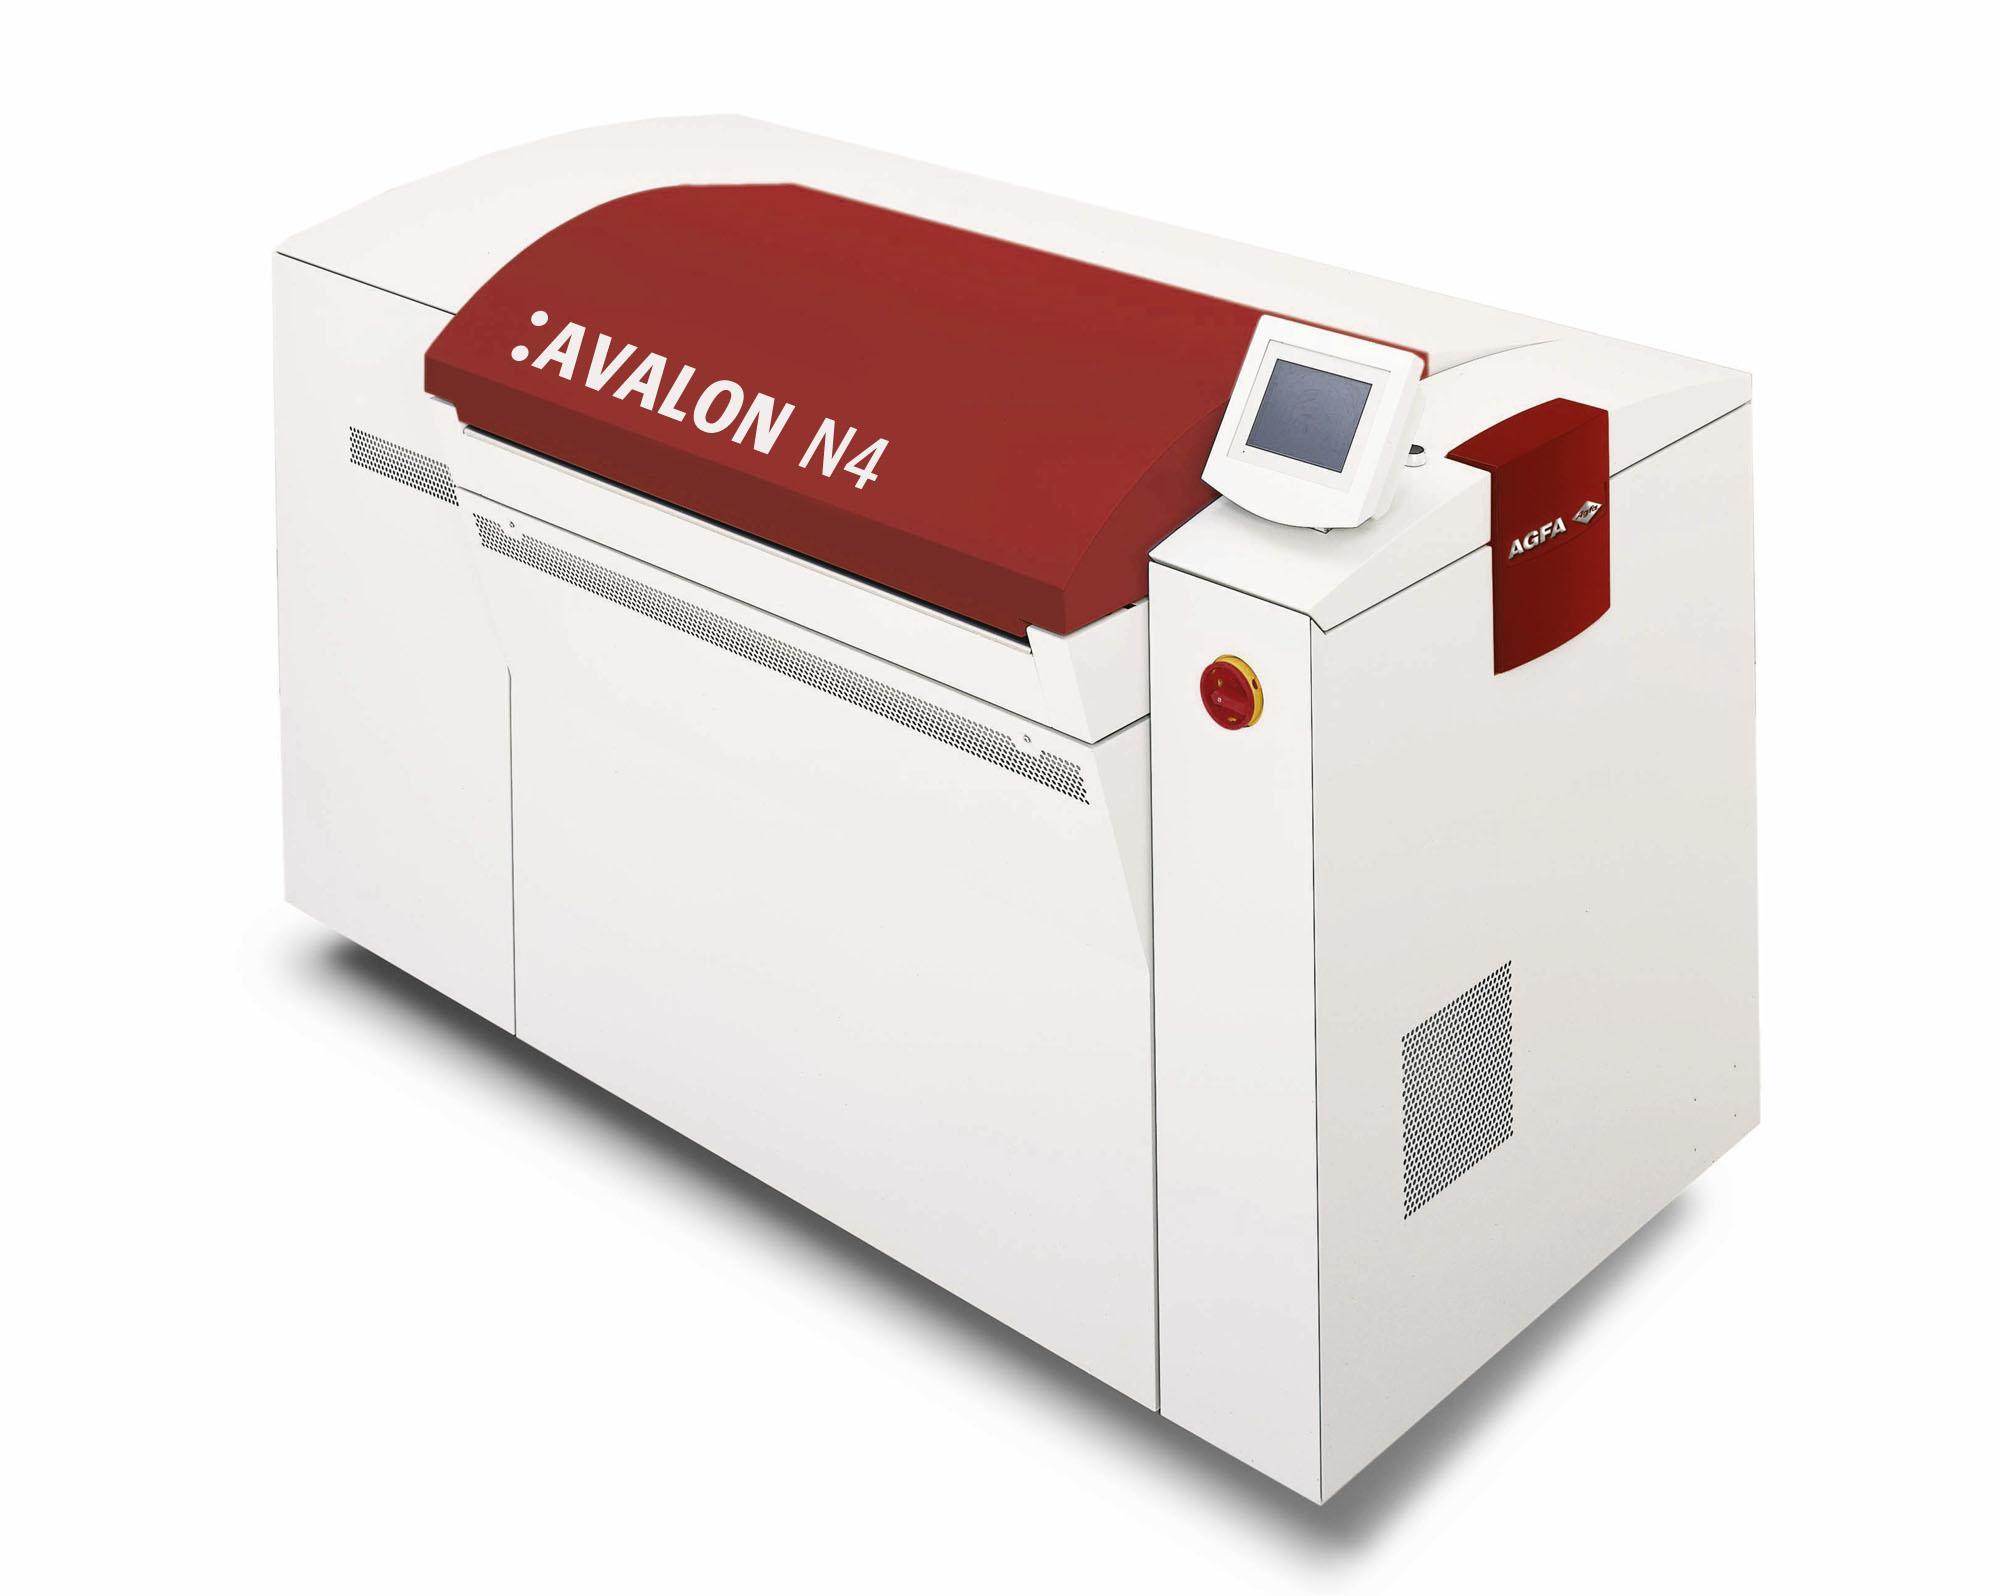 naświetlarka ctp Avalon N4 - AGFA